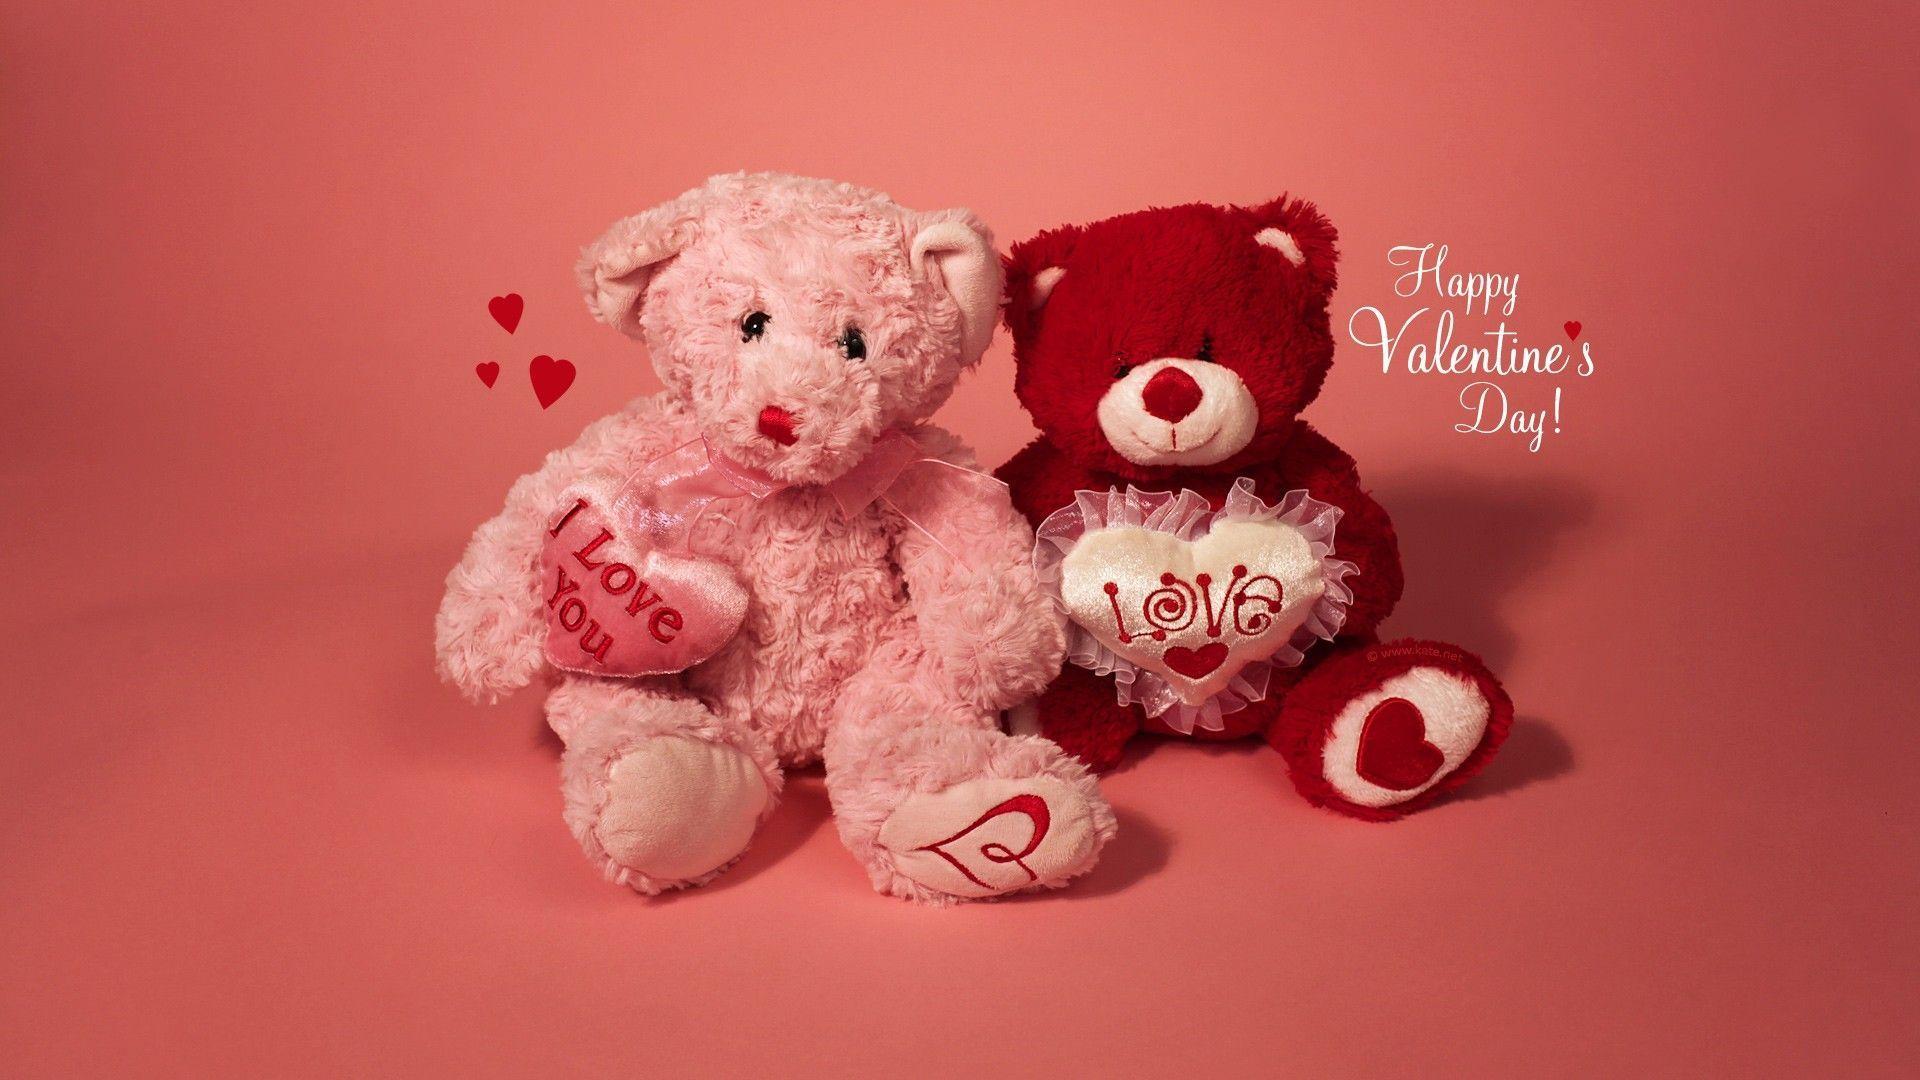 1920x1080 valentine. Happy Valentines Day Cute Picture HD Wallpaper Happy